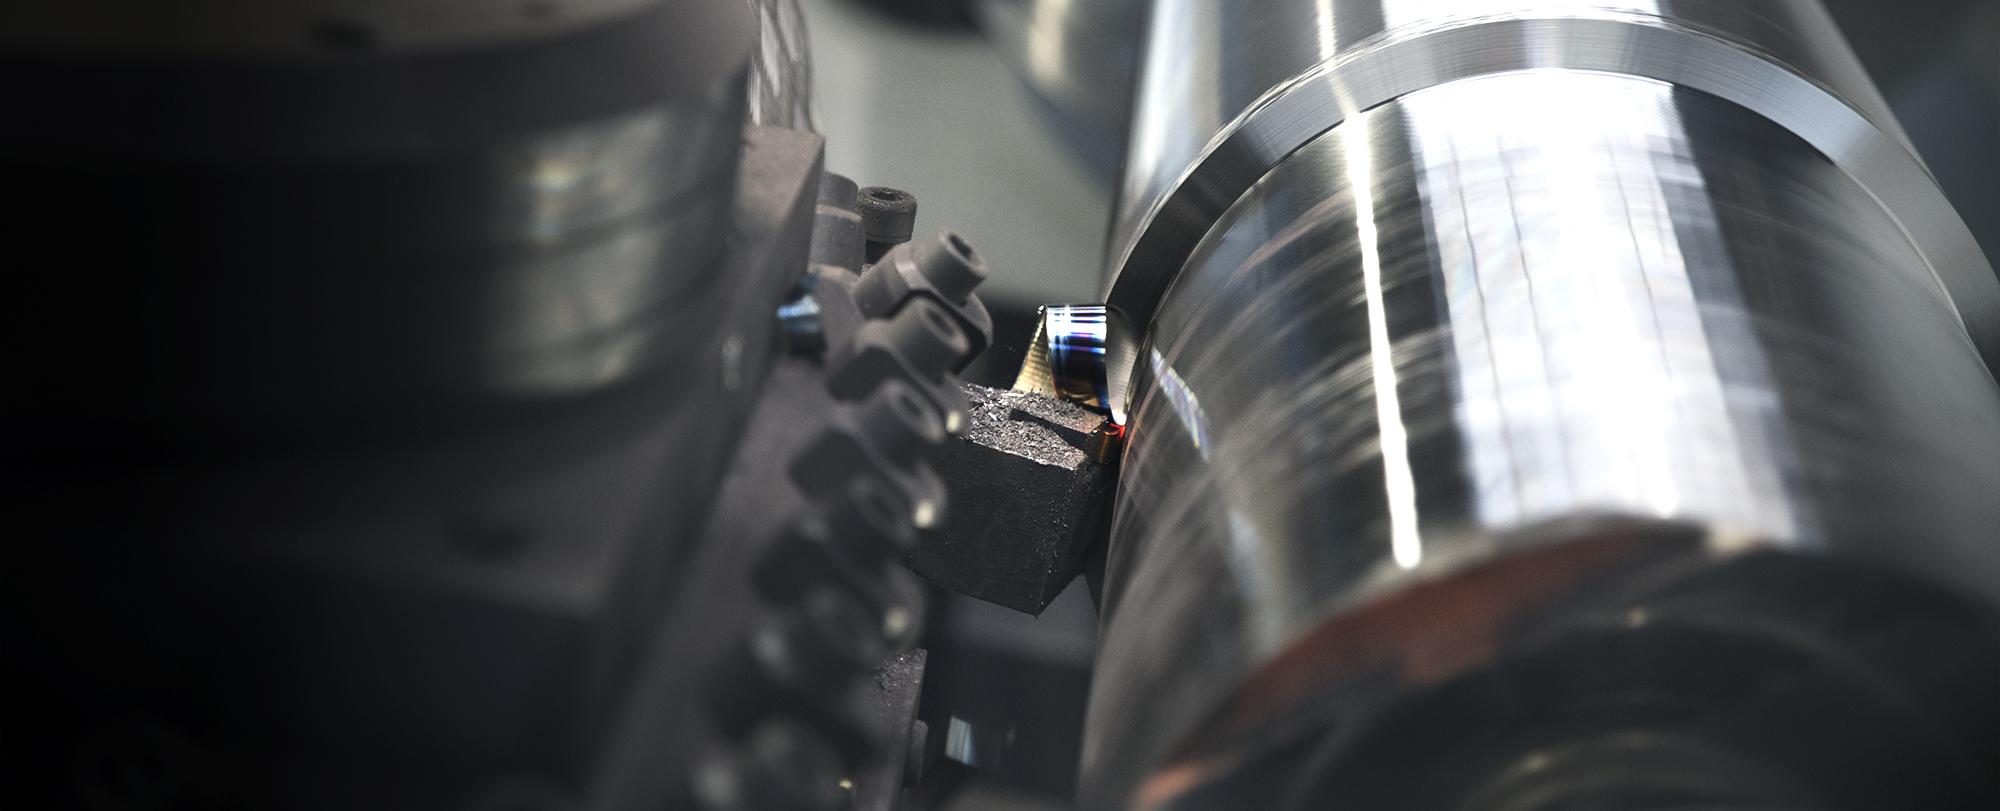 machine-tool-metalworking-lathe-gurutzpe